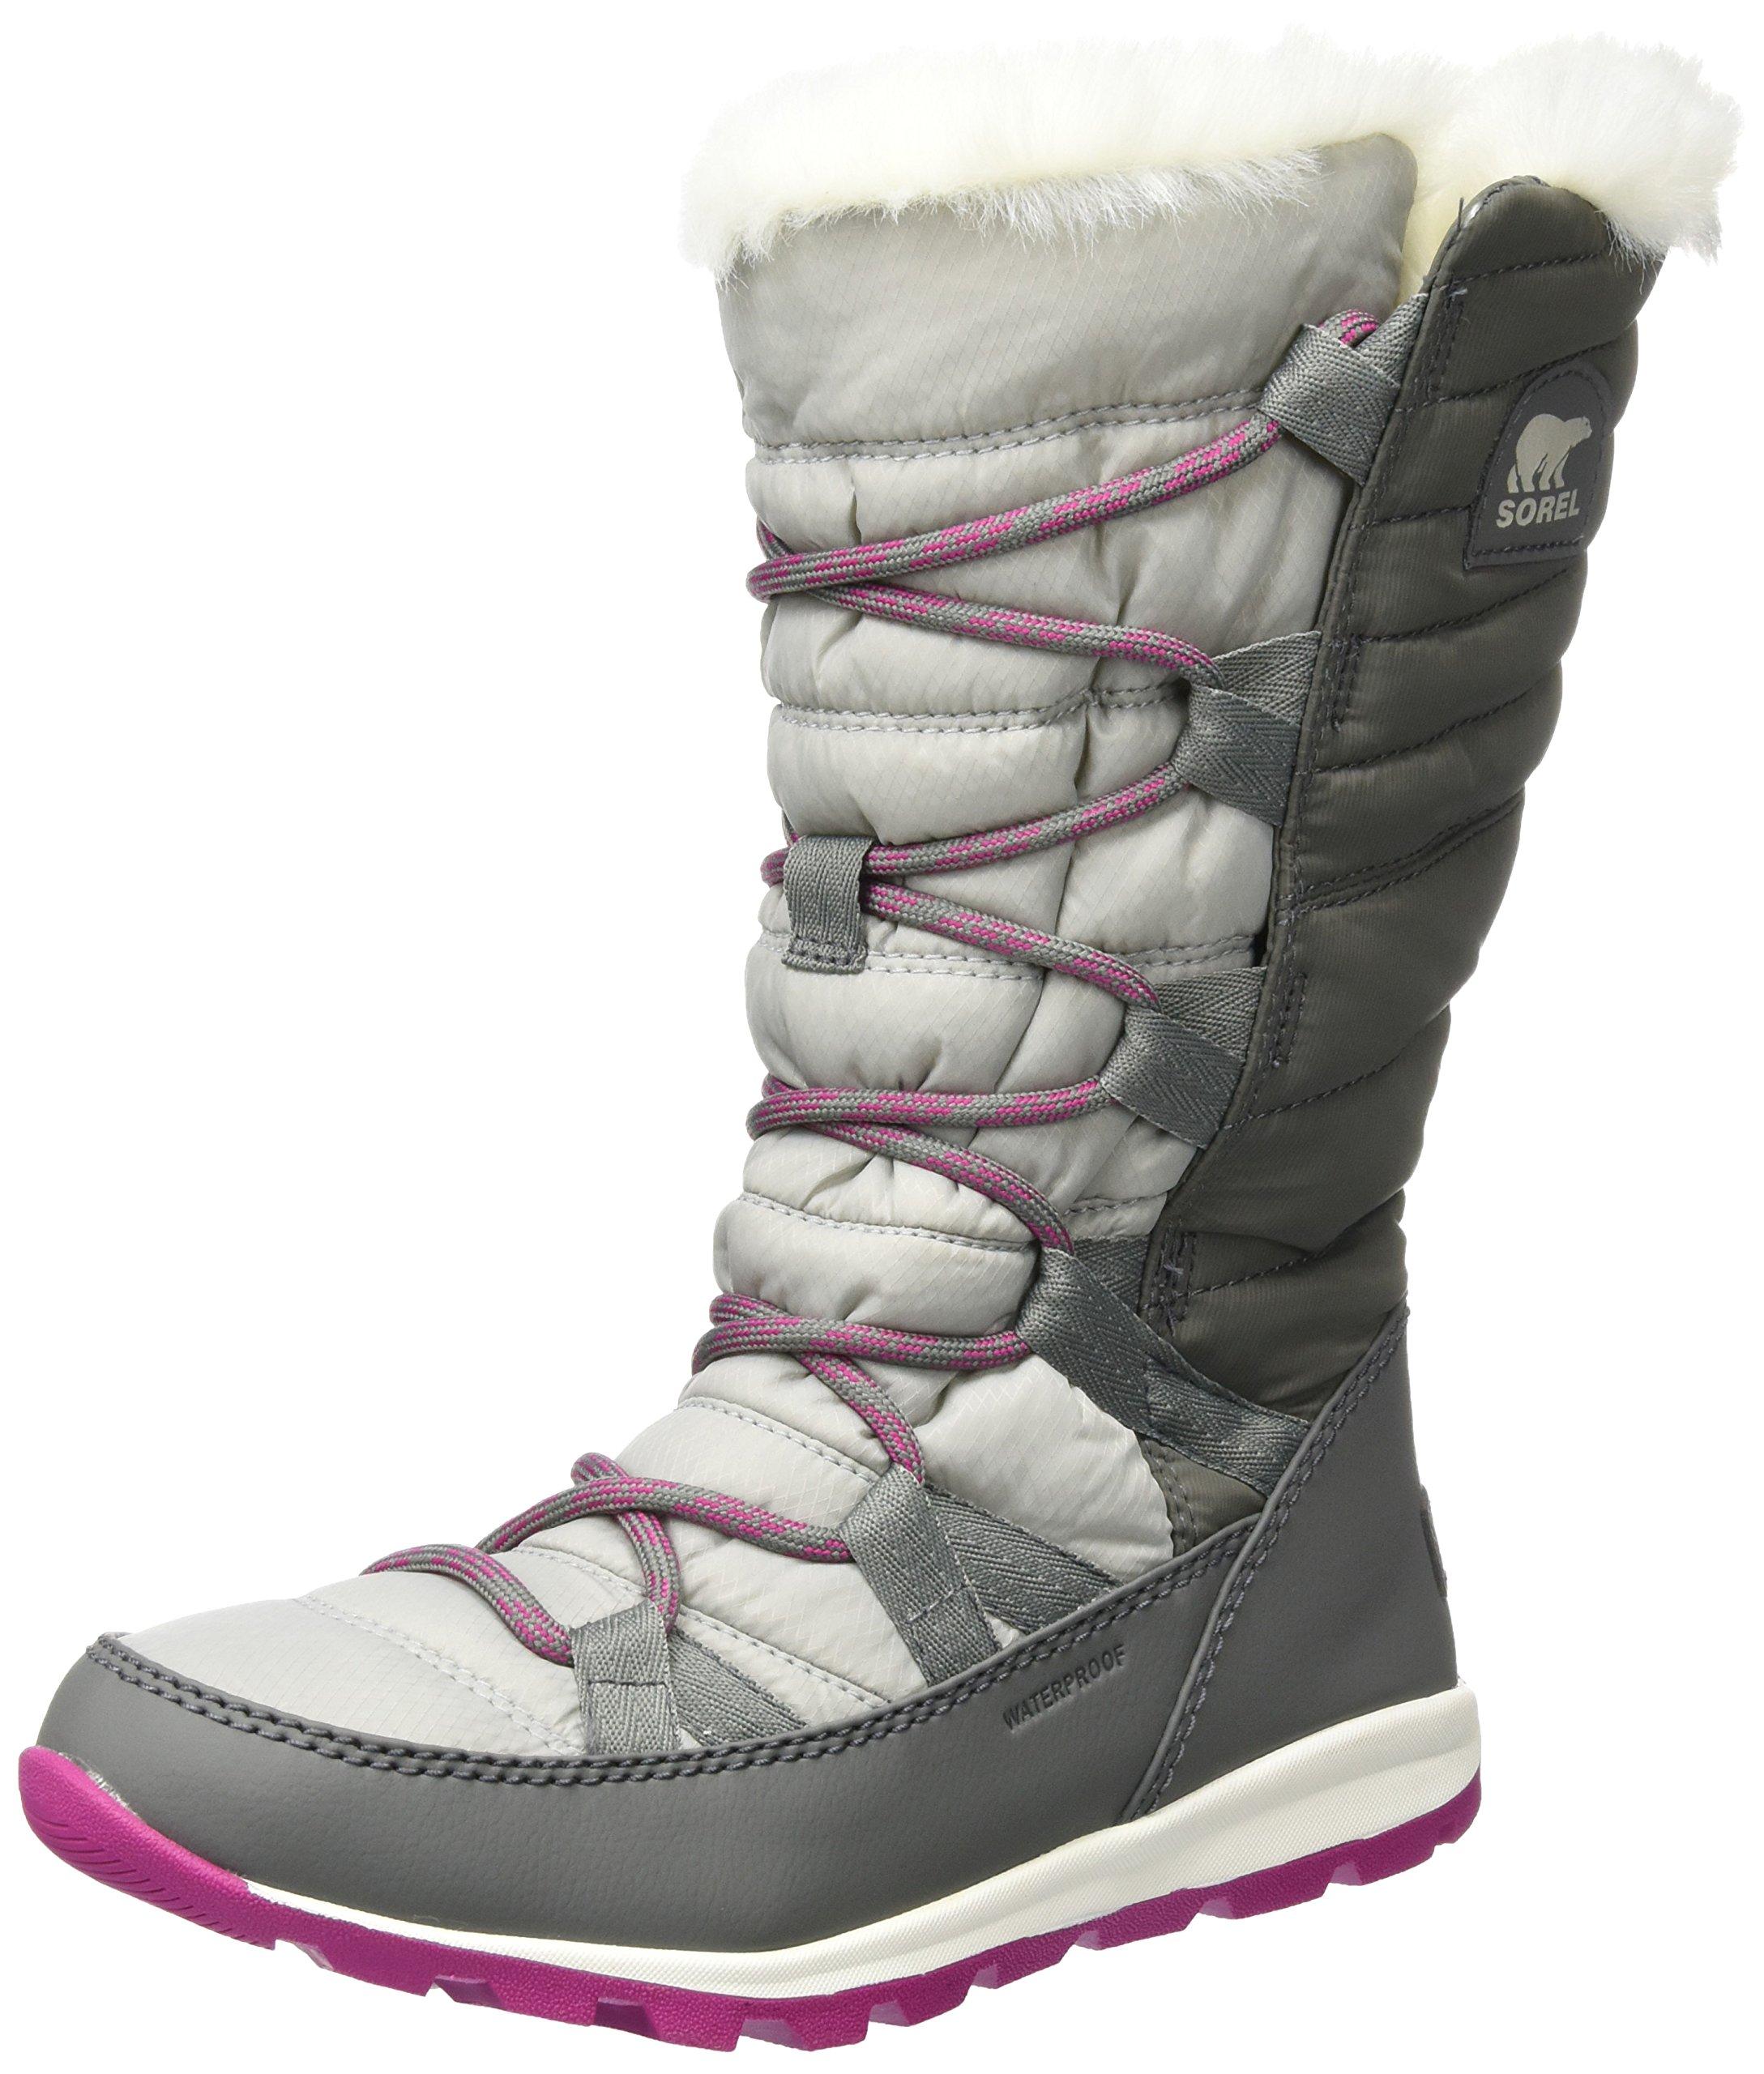 SOREL Womens Whitney Lace Fleece Winter Waterproof Rain Thermal Boots - Quarry - 11